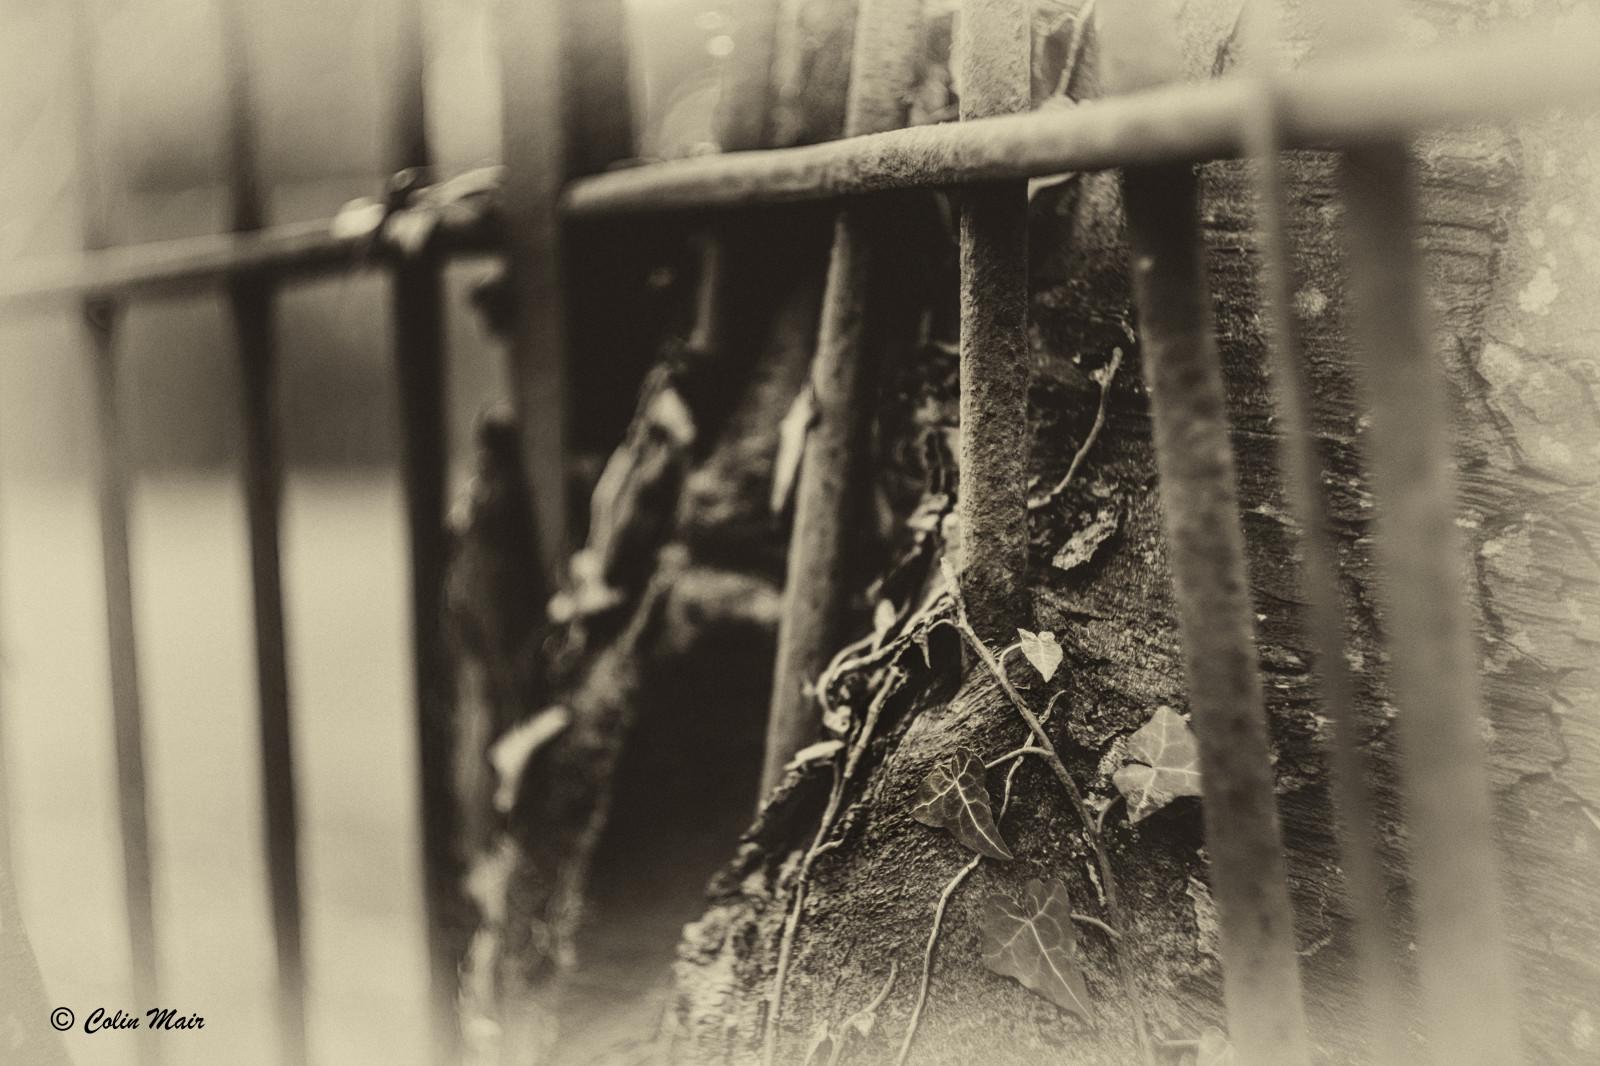 Wallpaper : old, Sony, fence, lens, Russian, USSR, tree, bw